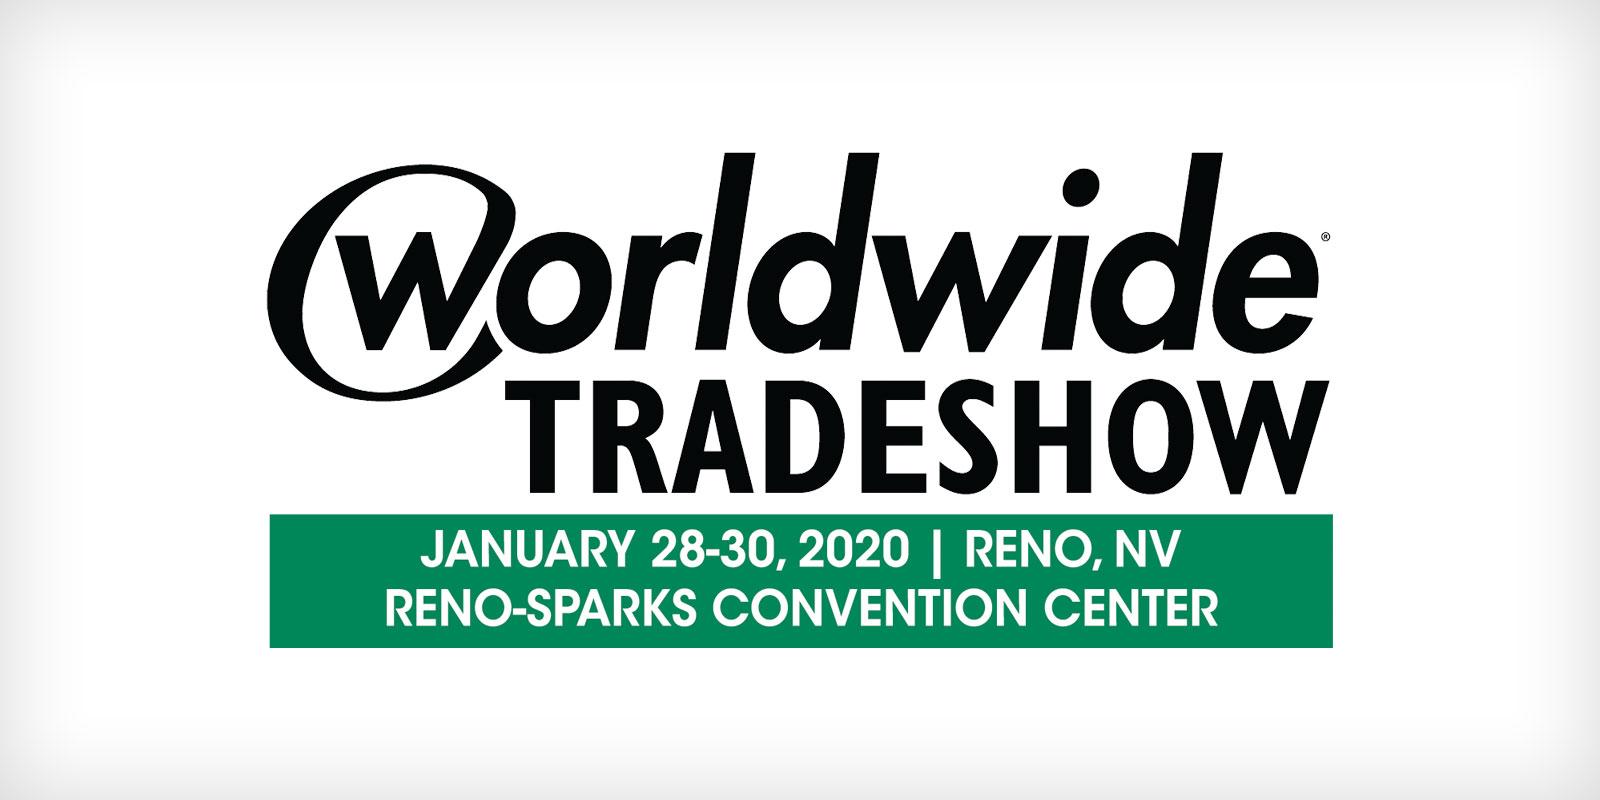 Worldwide Trade Show